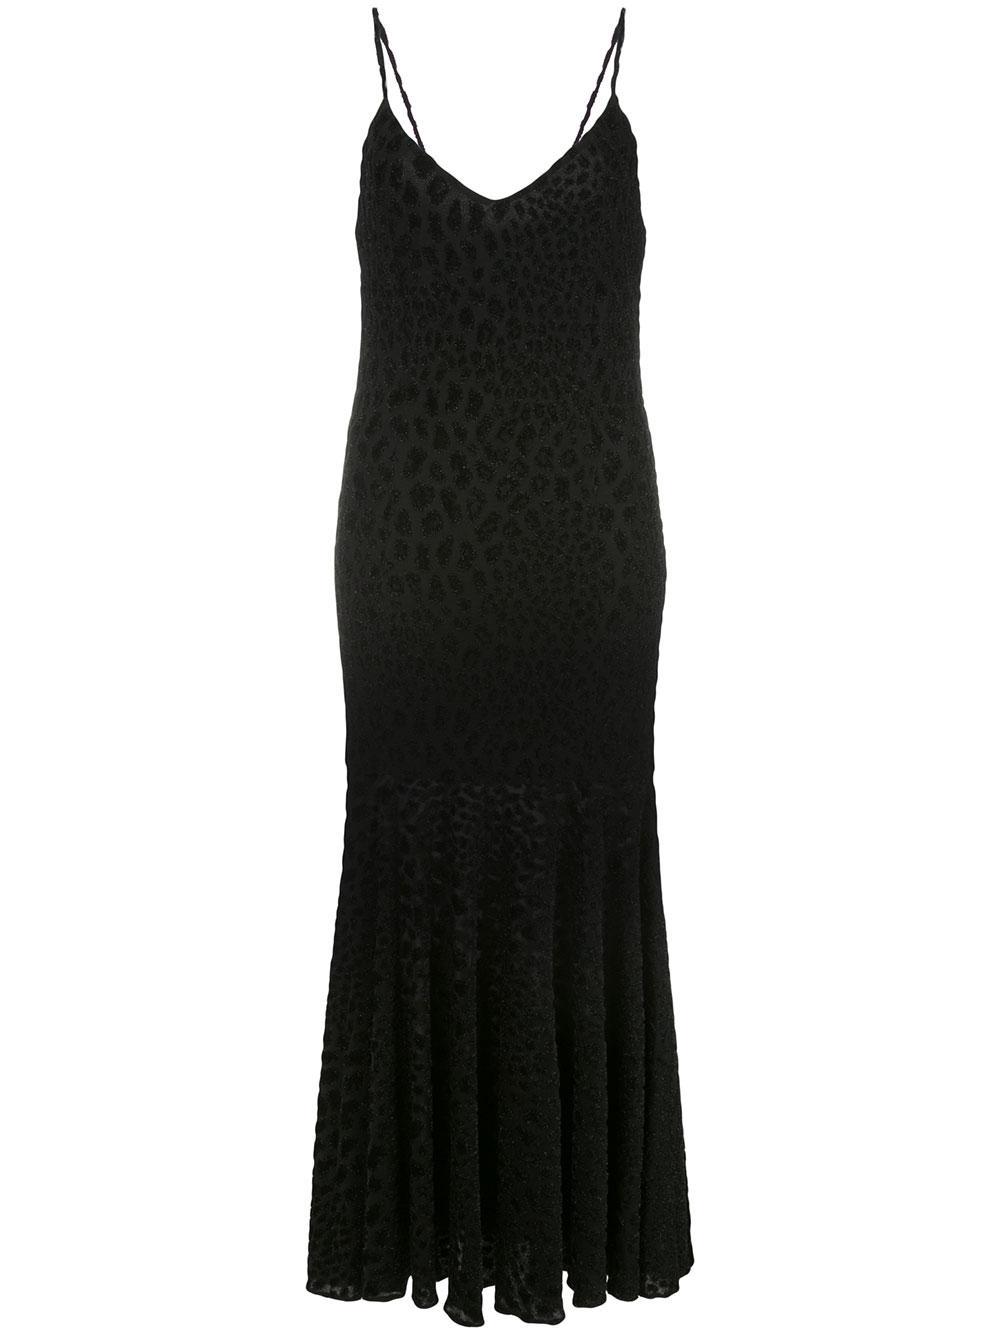 Kai Cut Velvet Animal Print Slip Maxi Dress Item # D266-LPD-F19